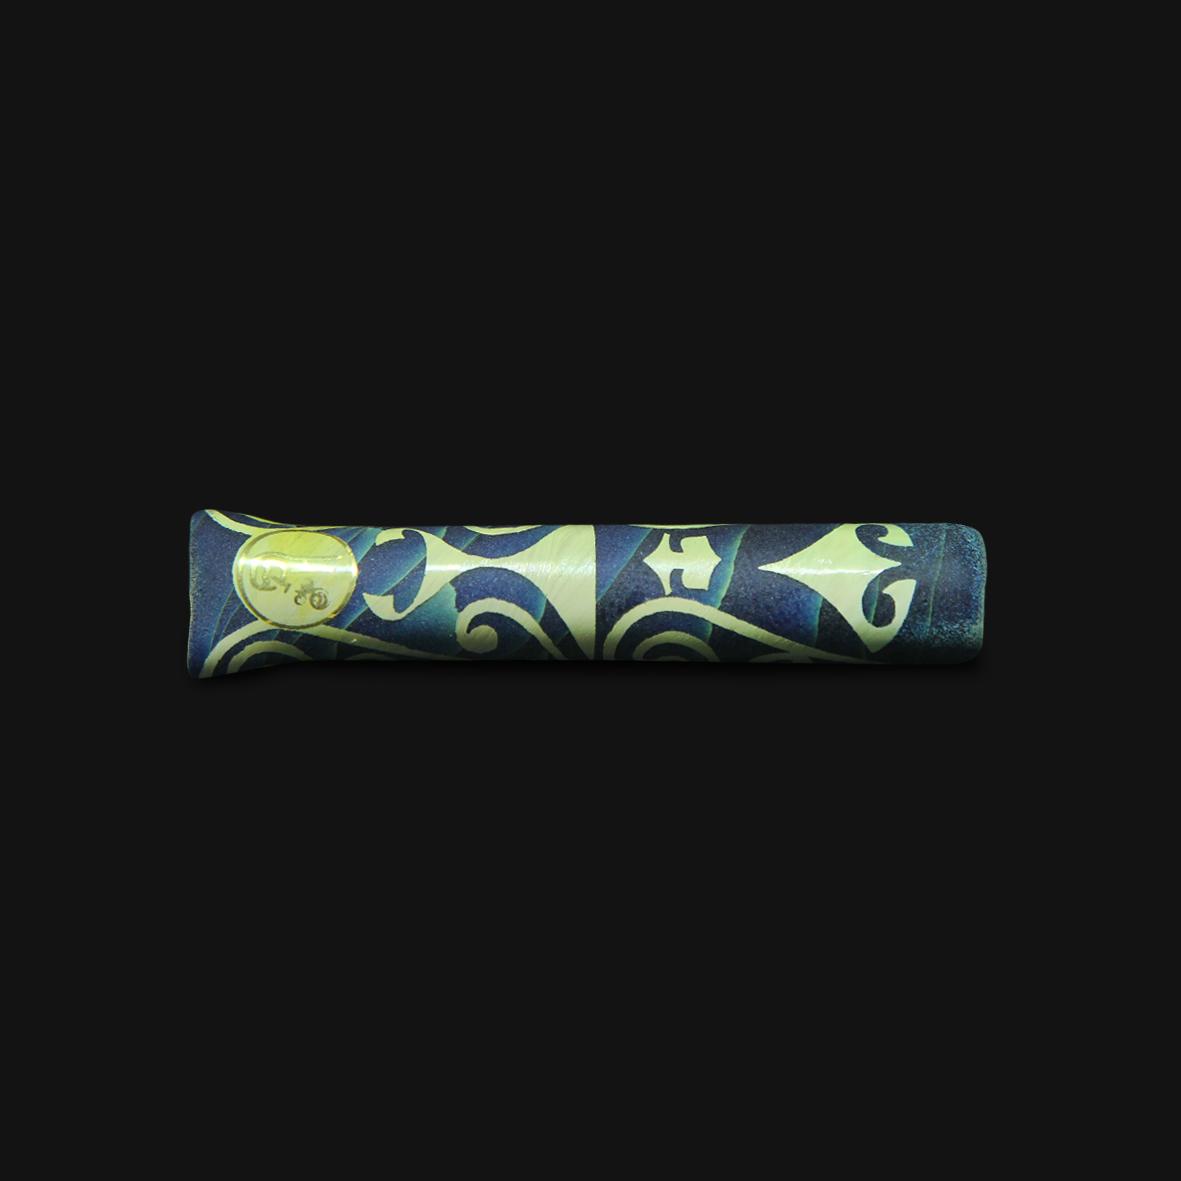 Piteira de Vidro Highblast 2 - Blue Caramel #04